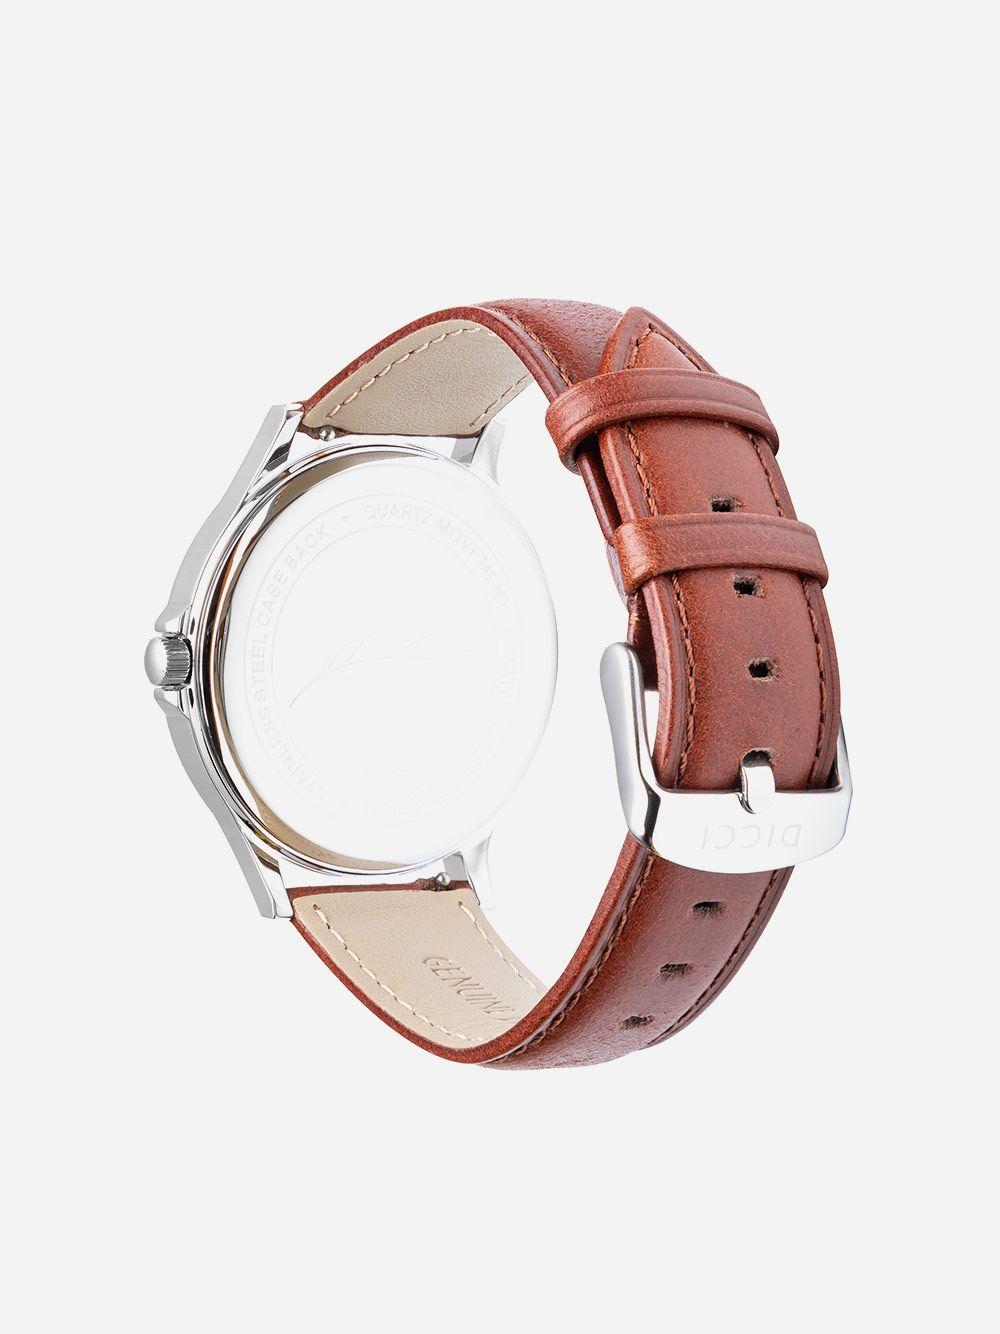 Black Watch Positano Leather | Dicci